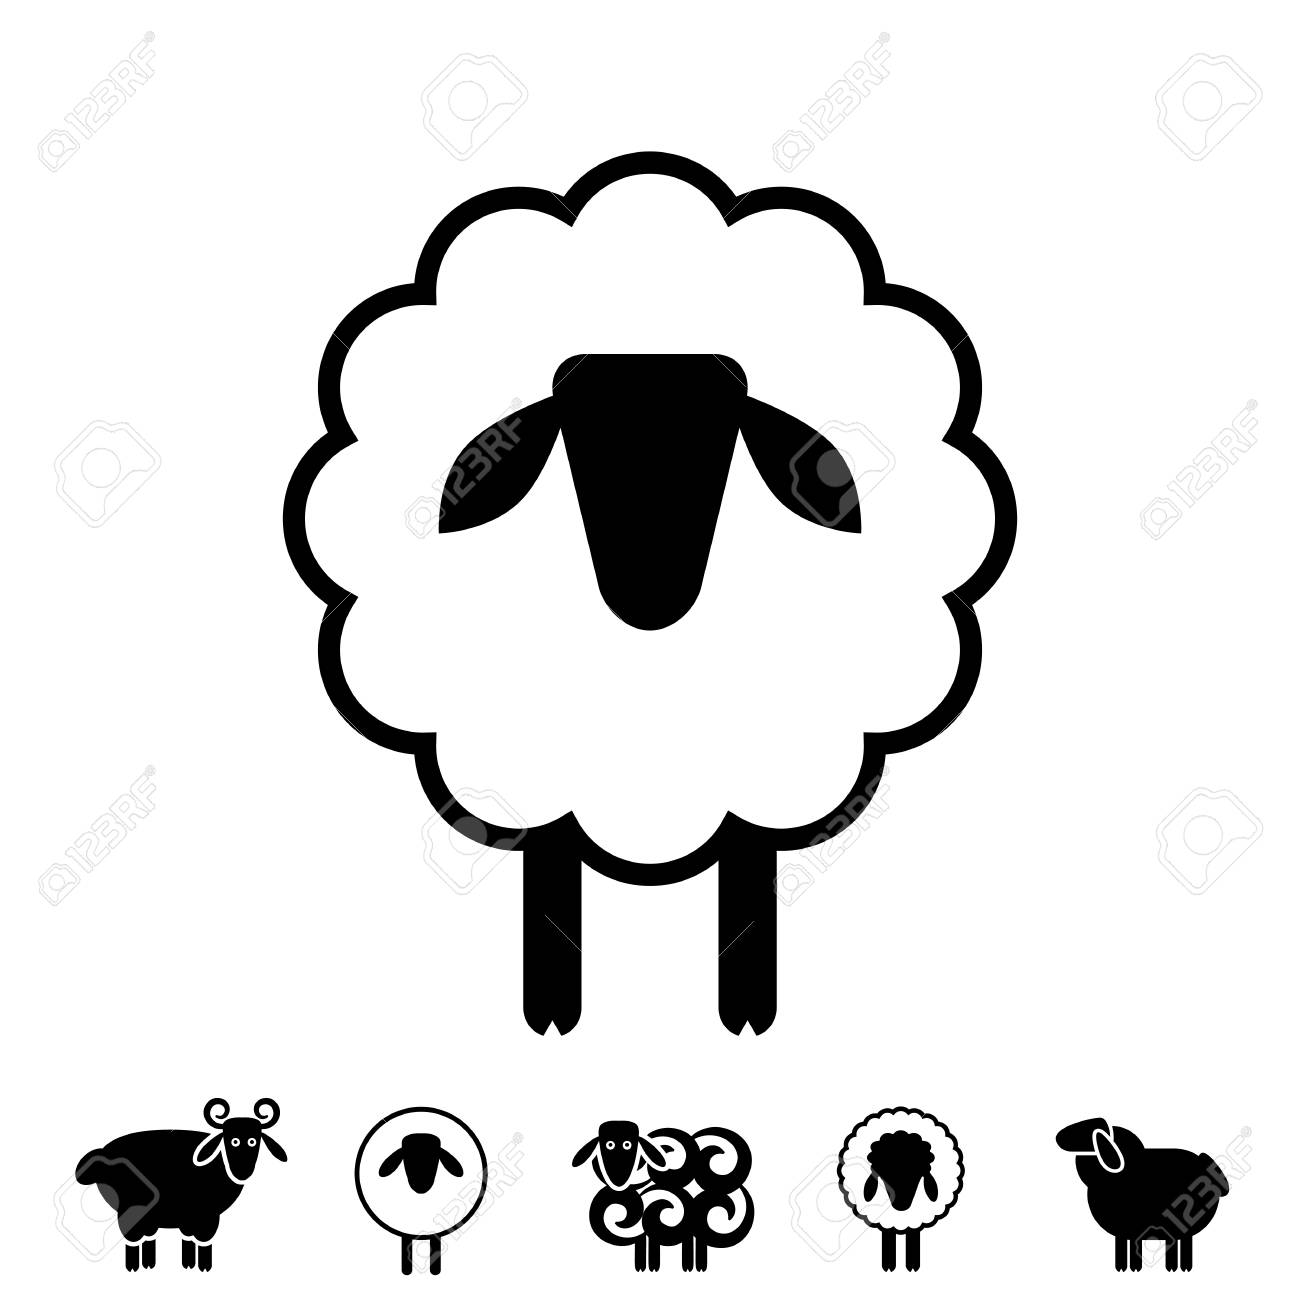 Sheep or Ram Icon, Logo, Template, Pictogram  Trendy Simple Lamb